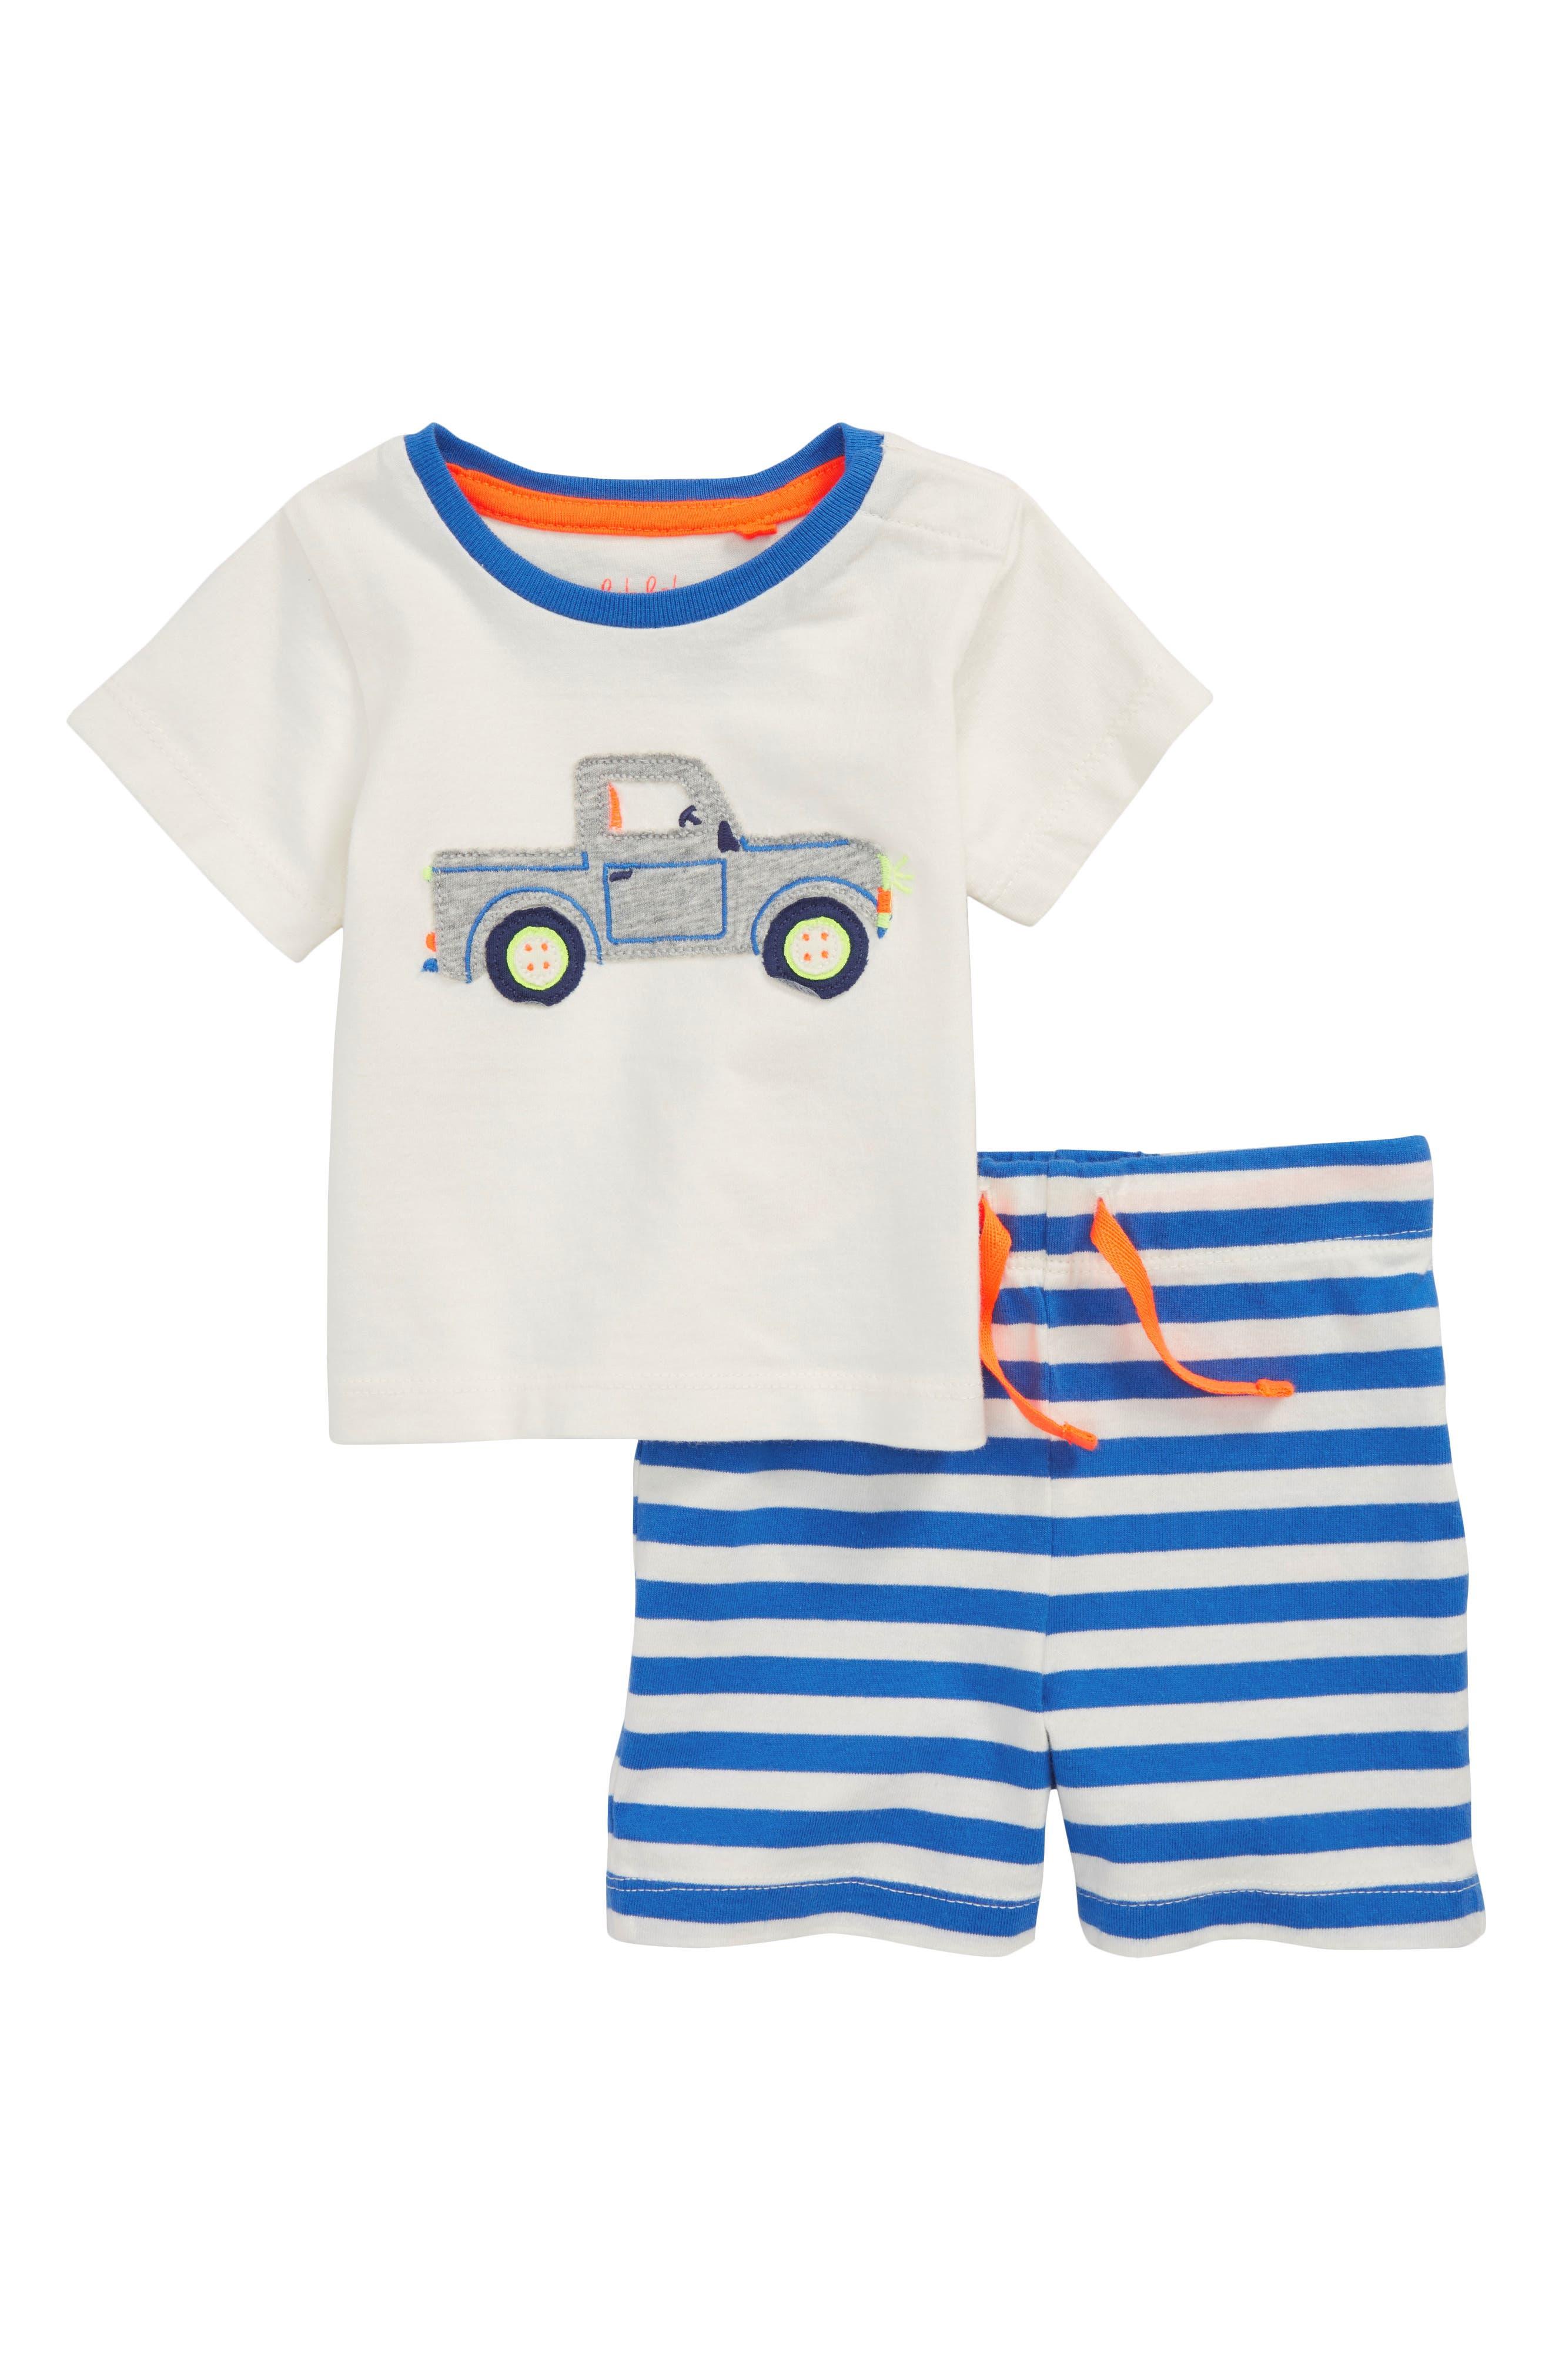 Fun Truck Appliqué T-Shirt & Shorts Set,                         Main,                         color,